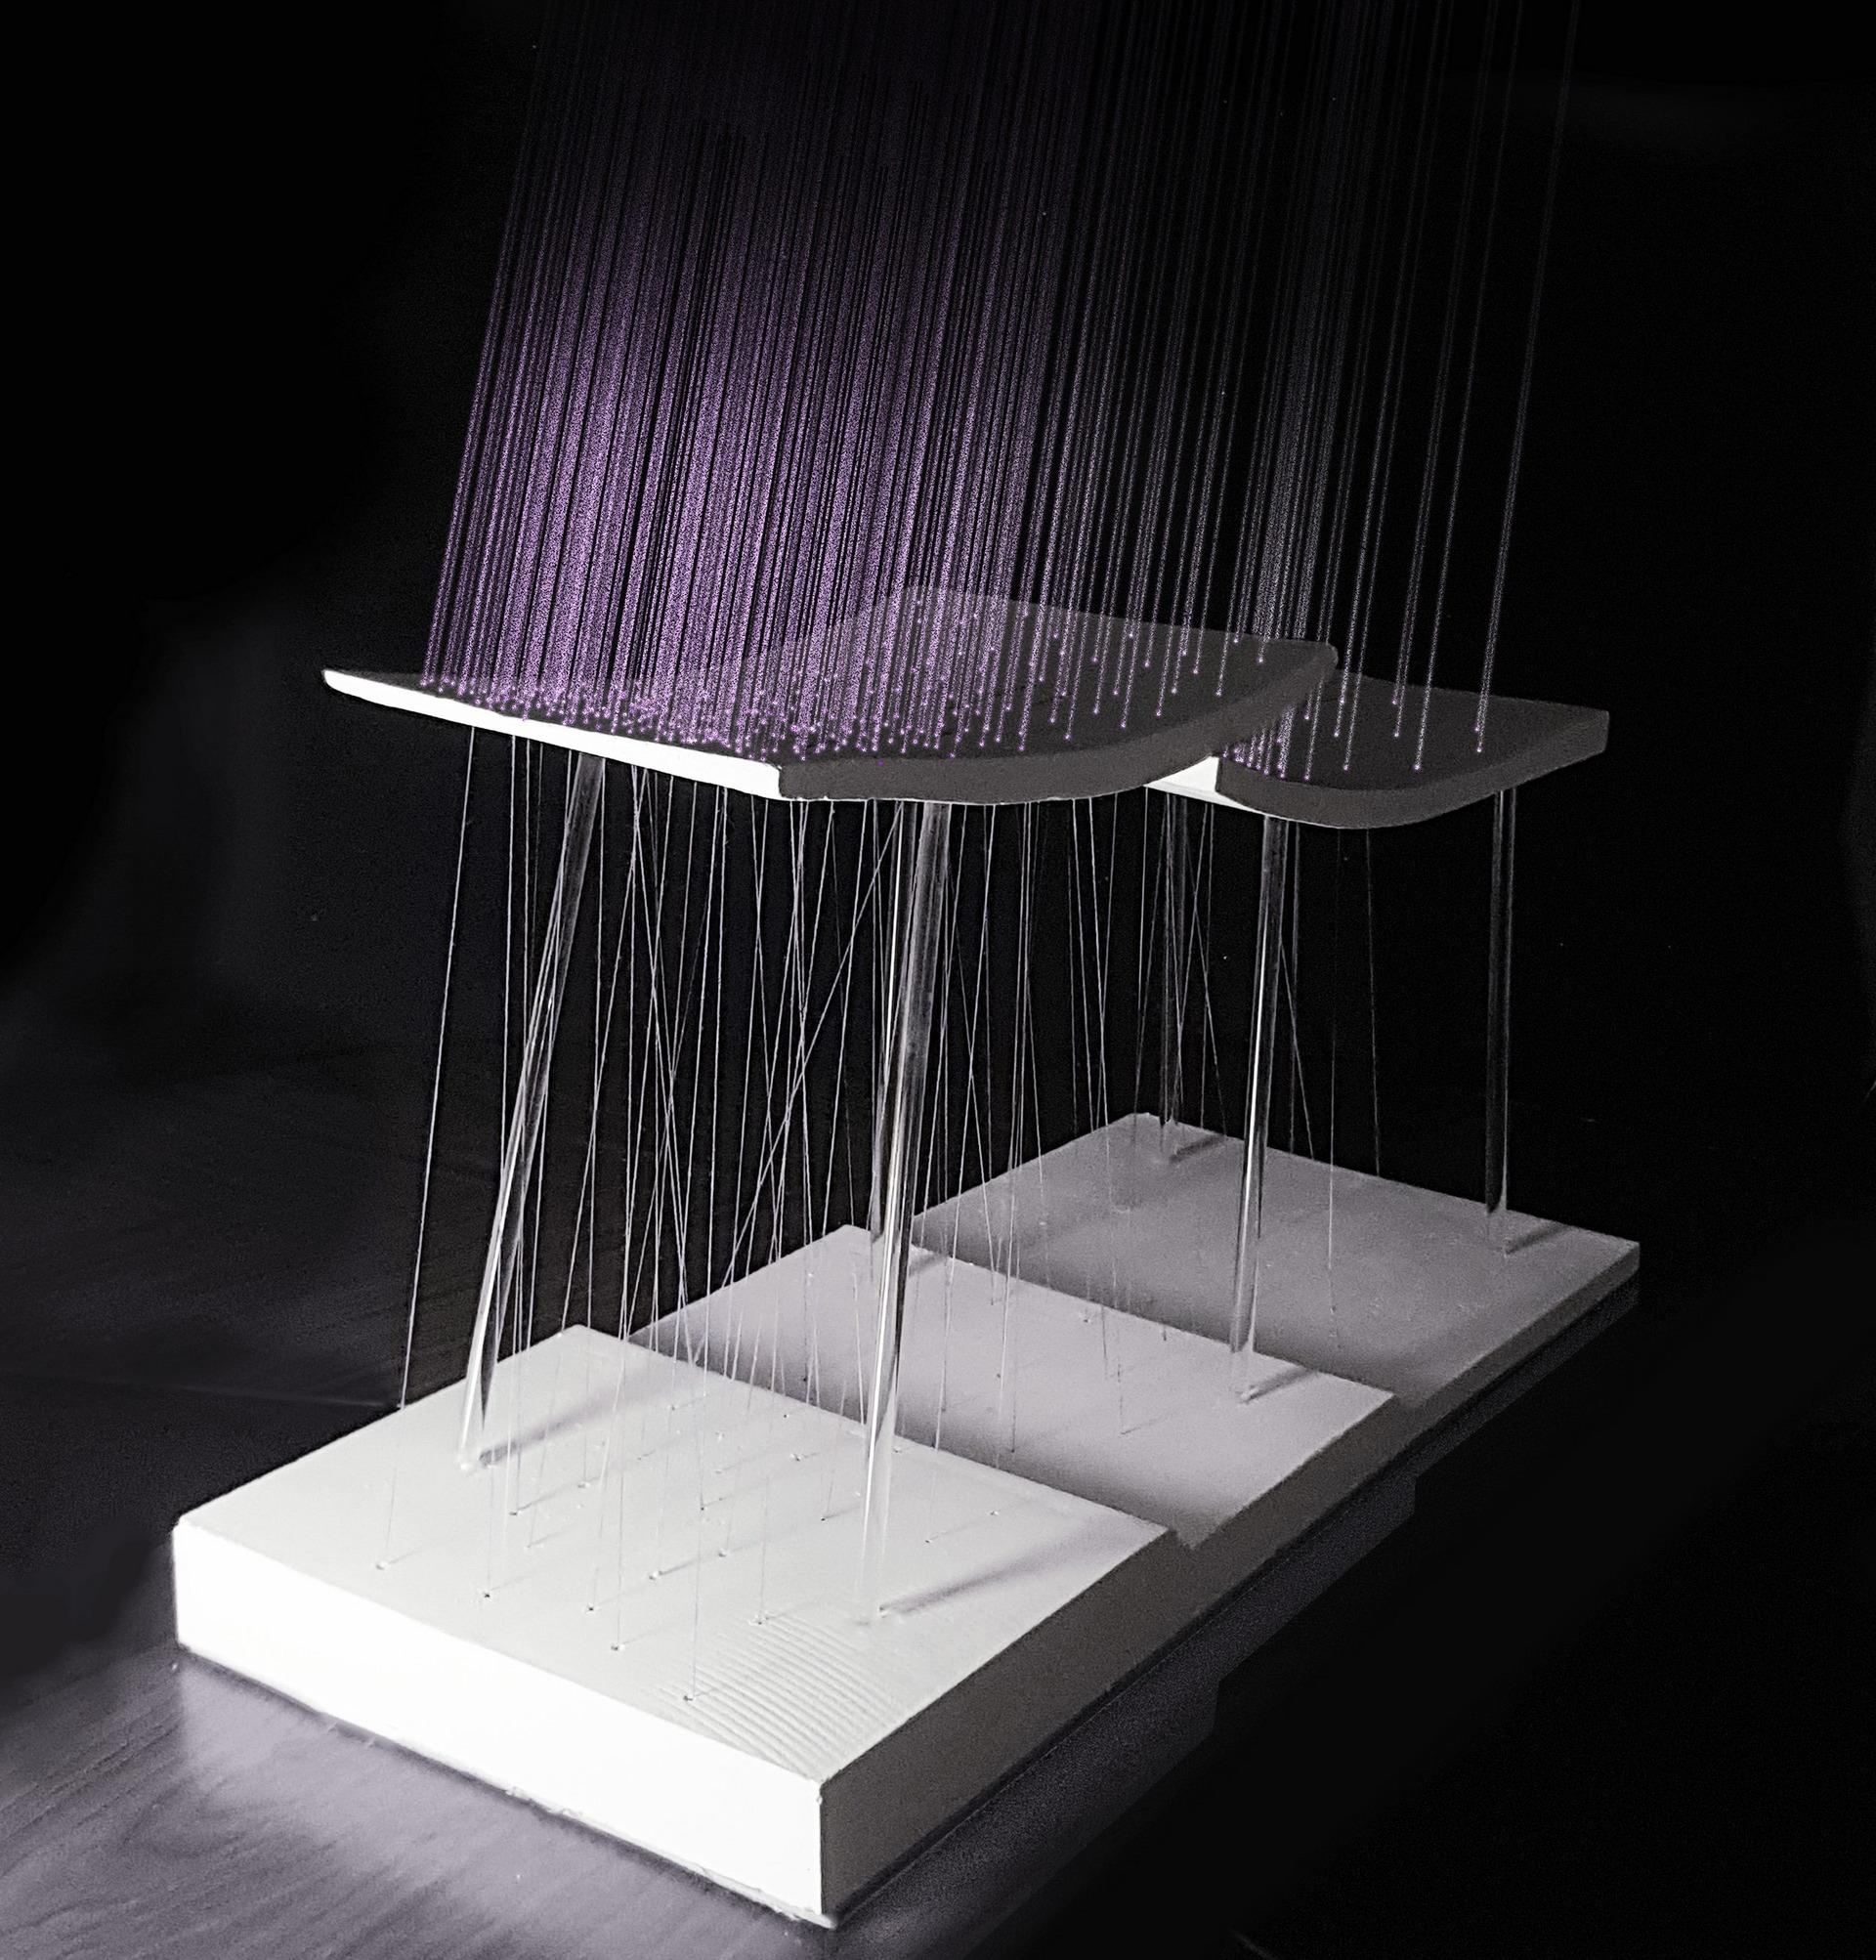 Plaster and Thread, lightness exploration.